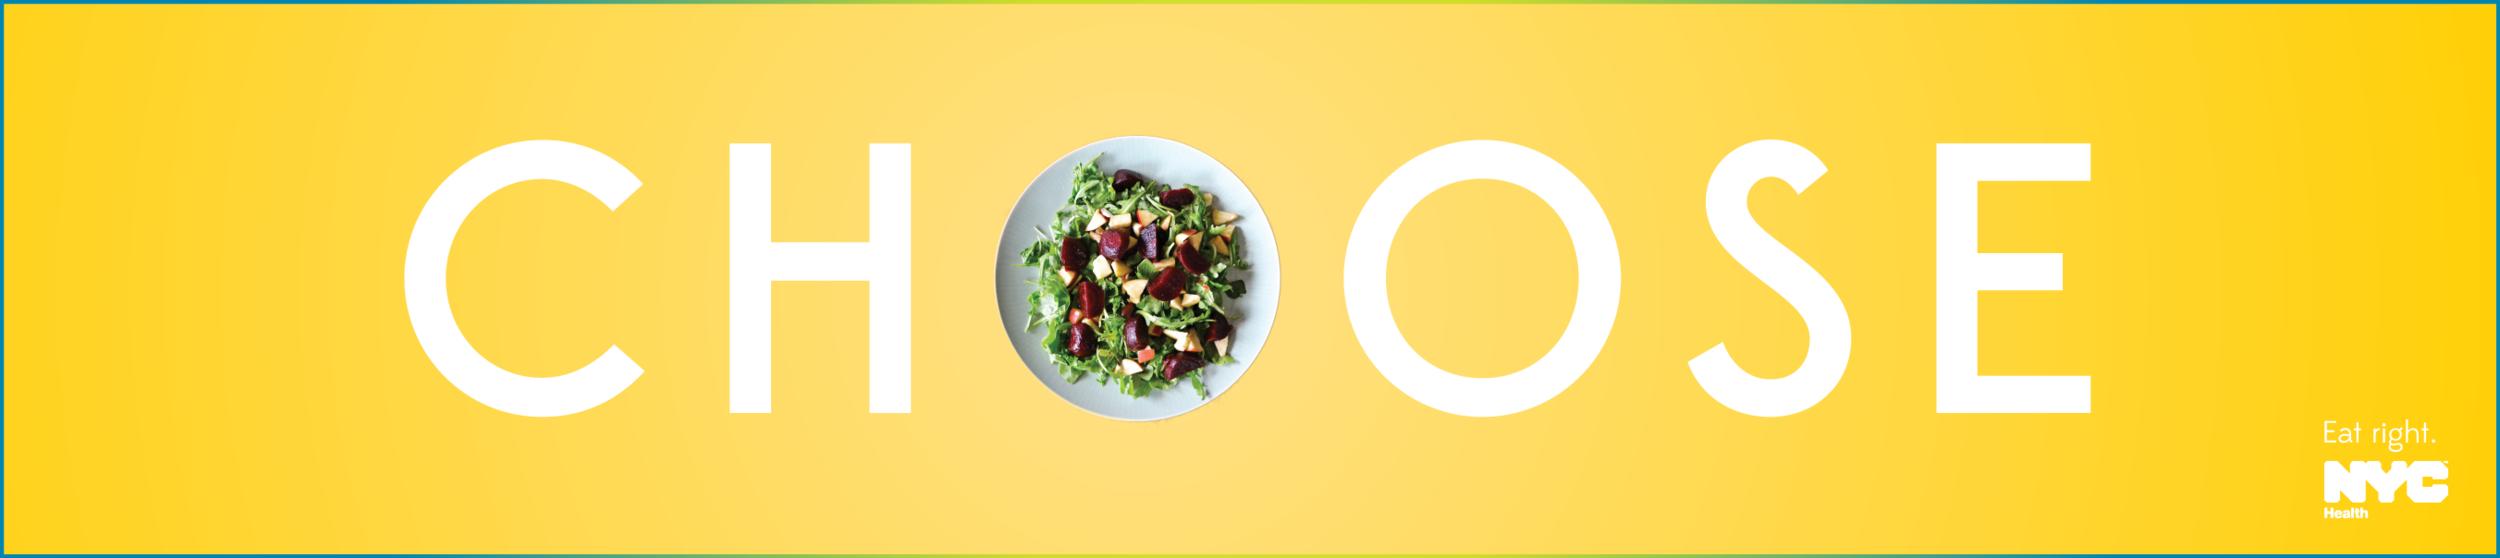 choose_salad.png